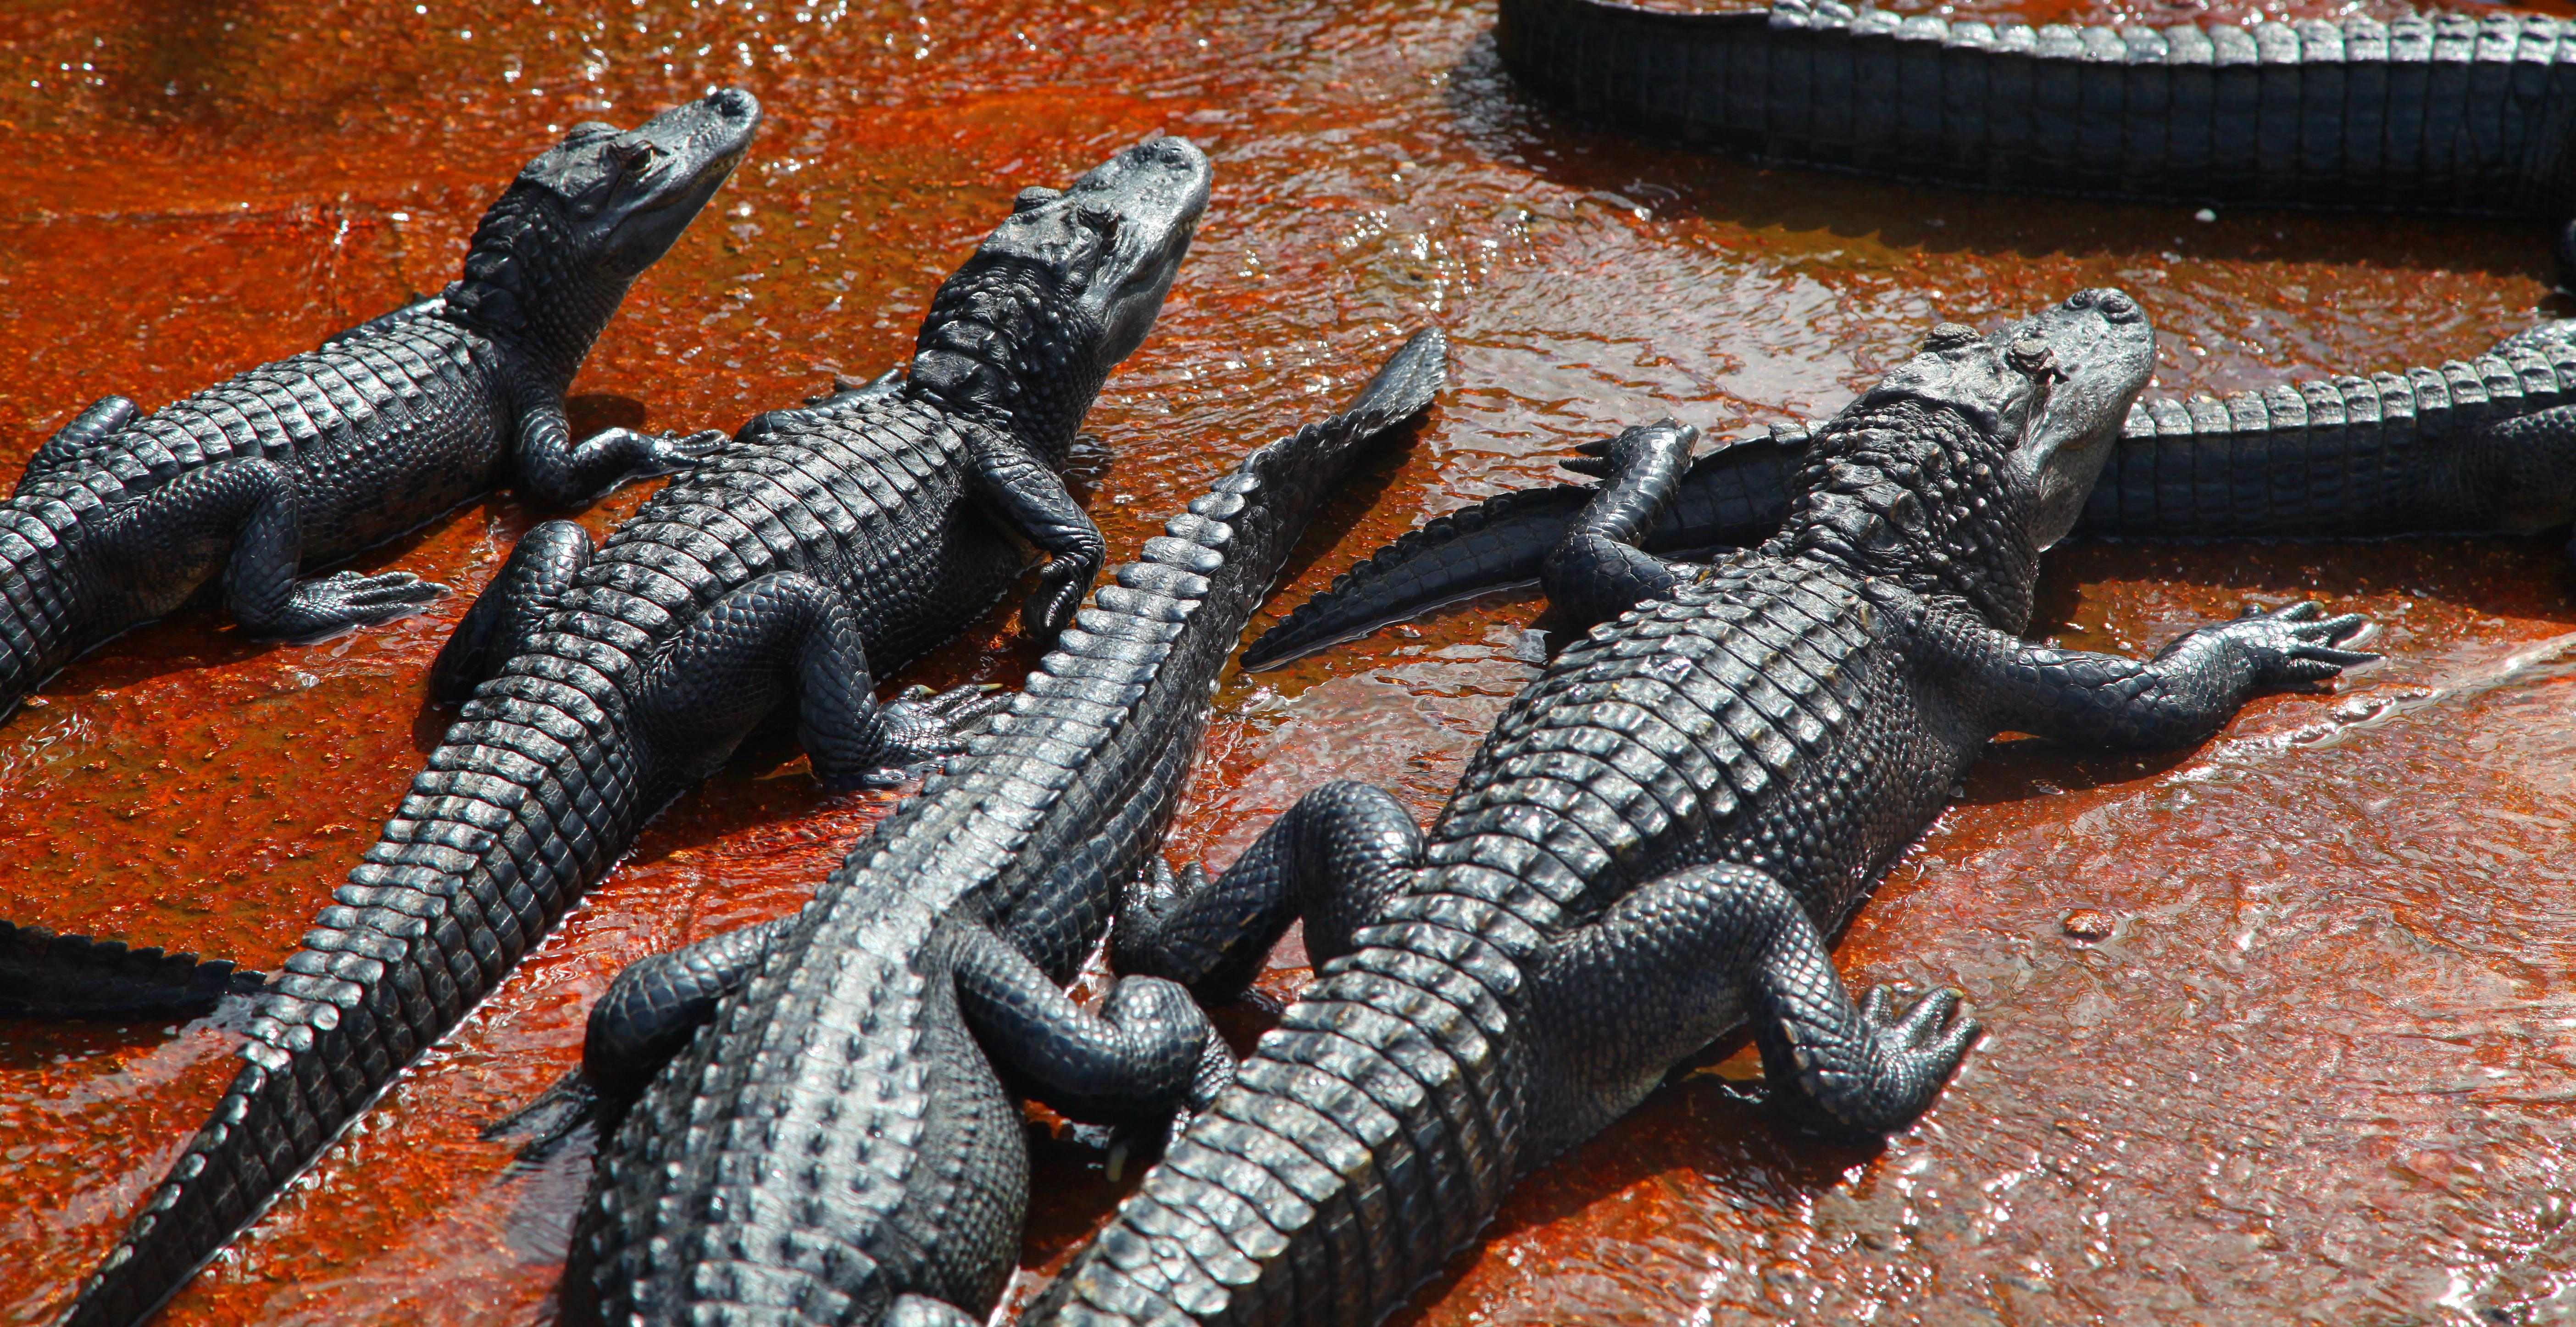 Alligator, Florida 2015